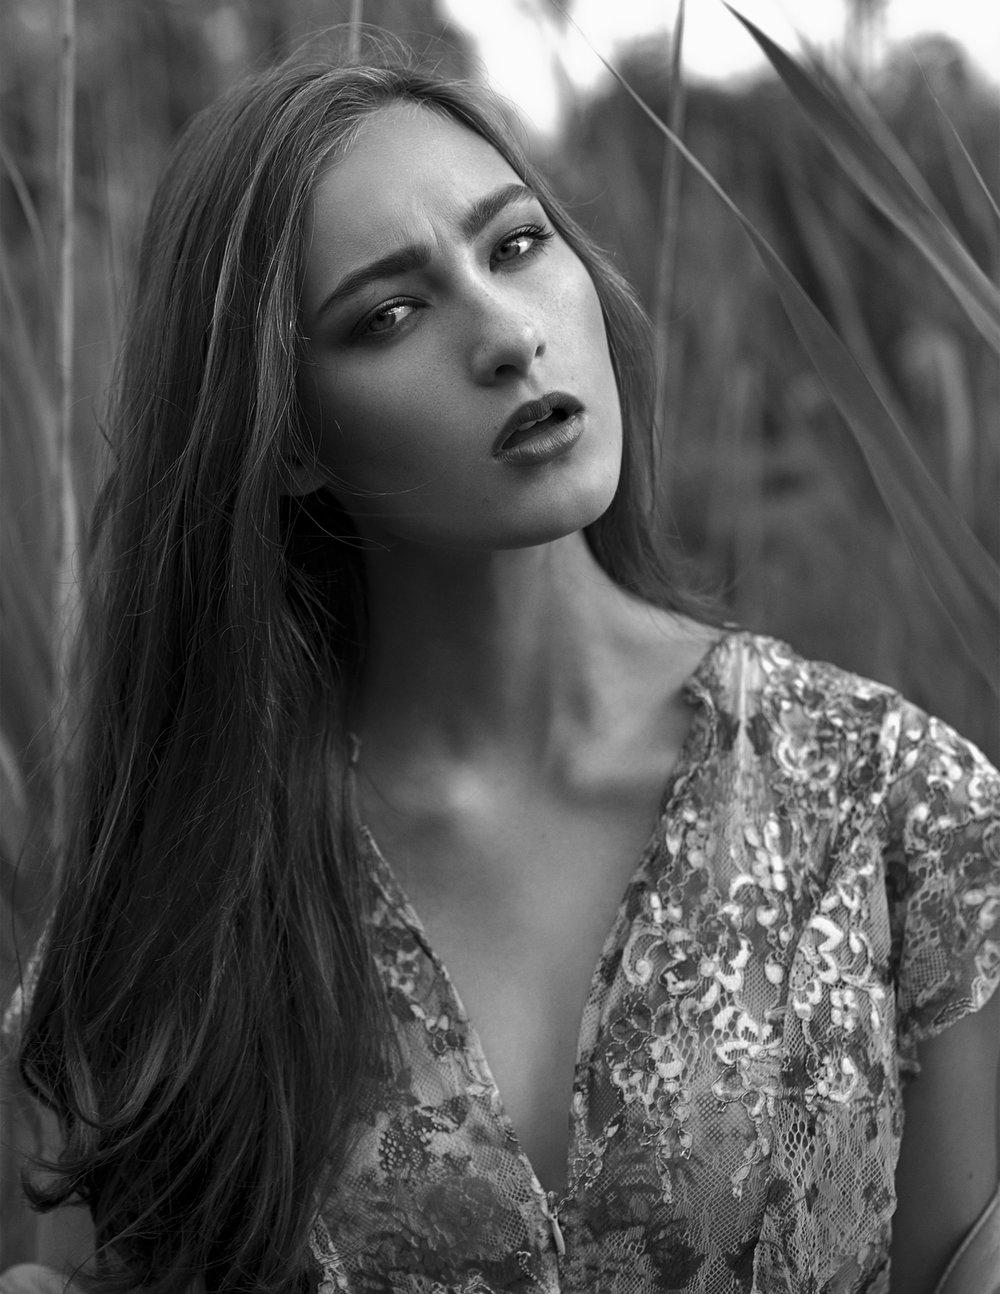 2Emilie_Tournevache_Boheme_Fashion_Editorial_Photographer.jpg